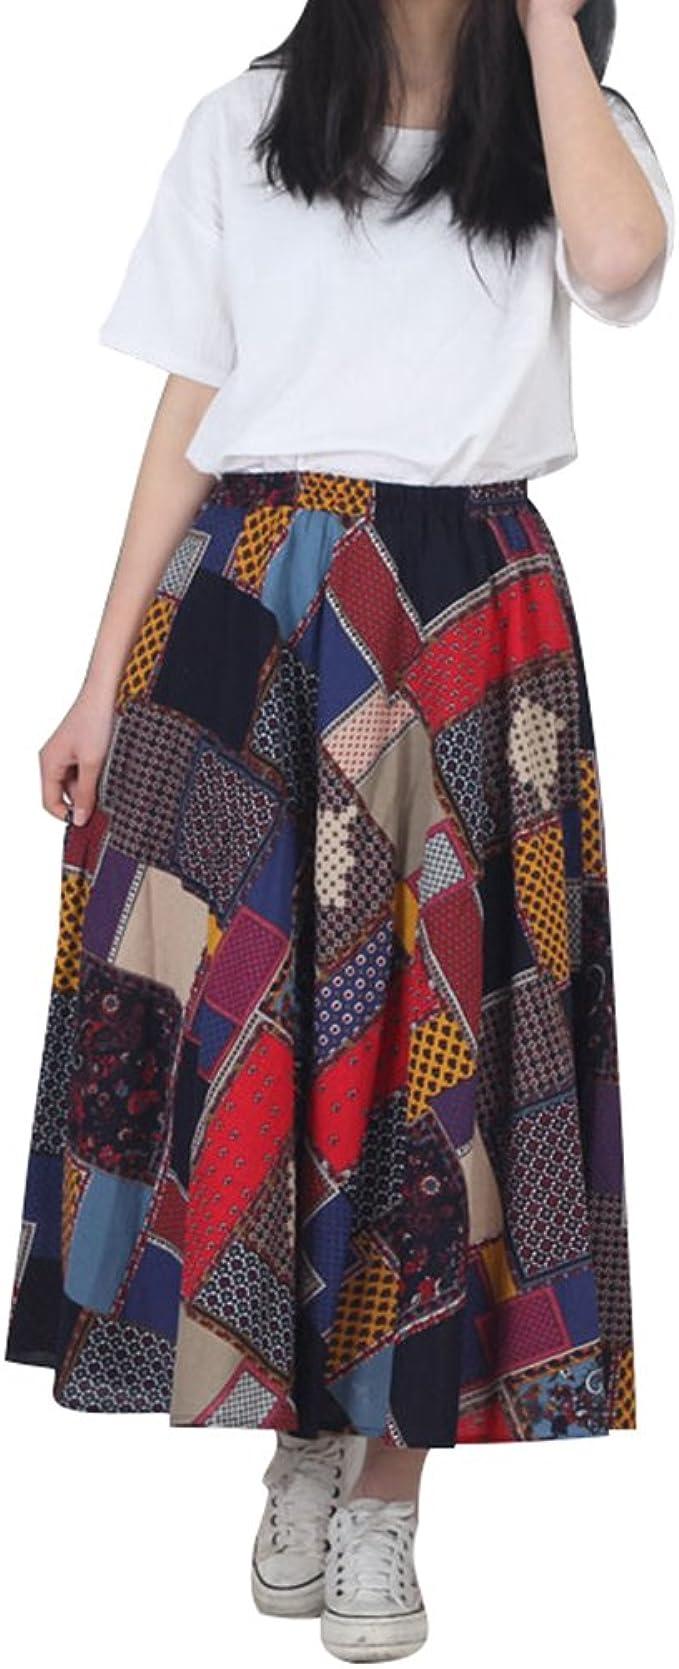 NiSeng Mujer Maxi Faldas Etnicas Largas Falda Larga Vintage Falda ...